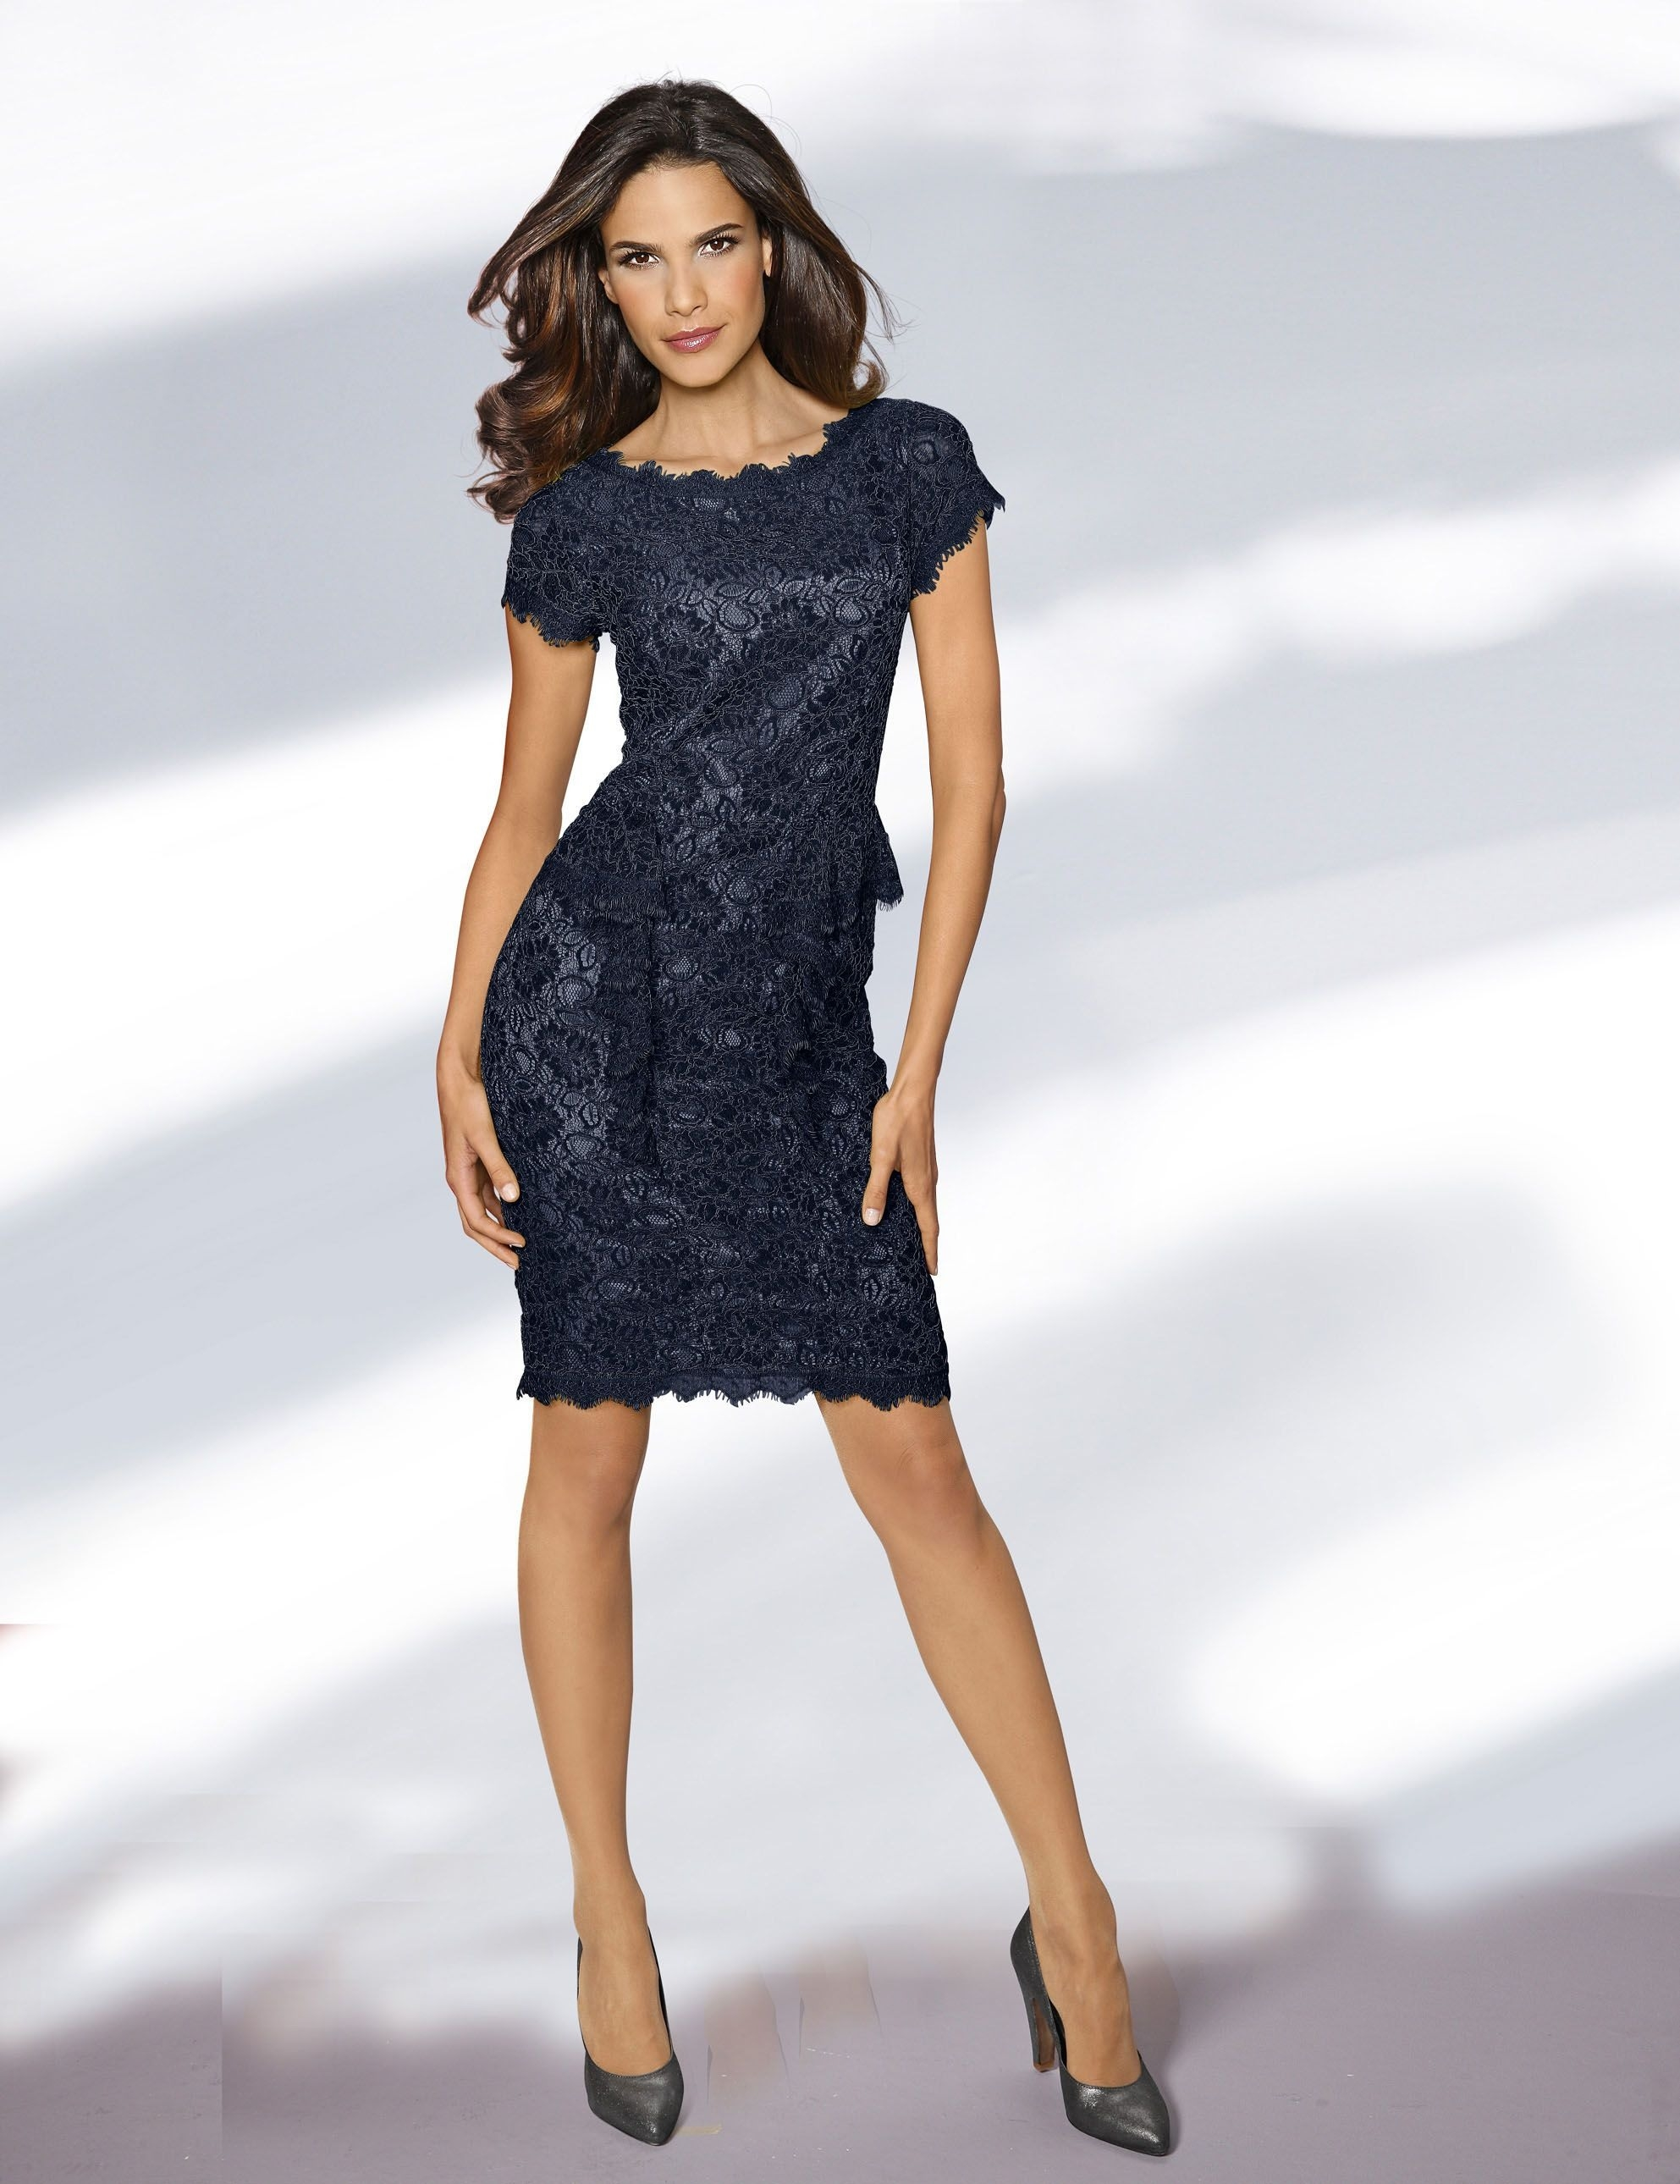 Formal Schön Dunkelblaues Kleid Spitze Bester PreisAbend Schön Dunkelblaues Kleid Spitze Ärmel